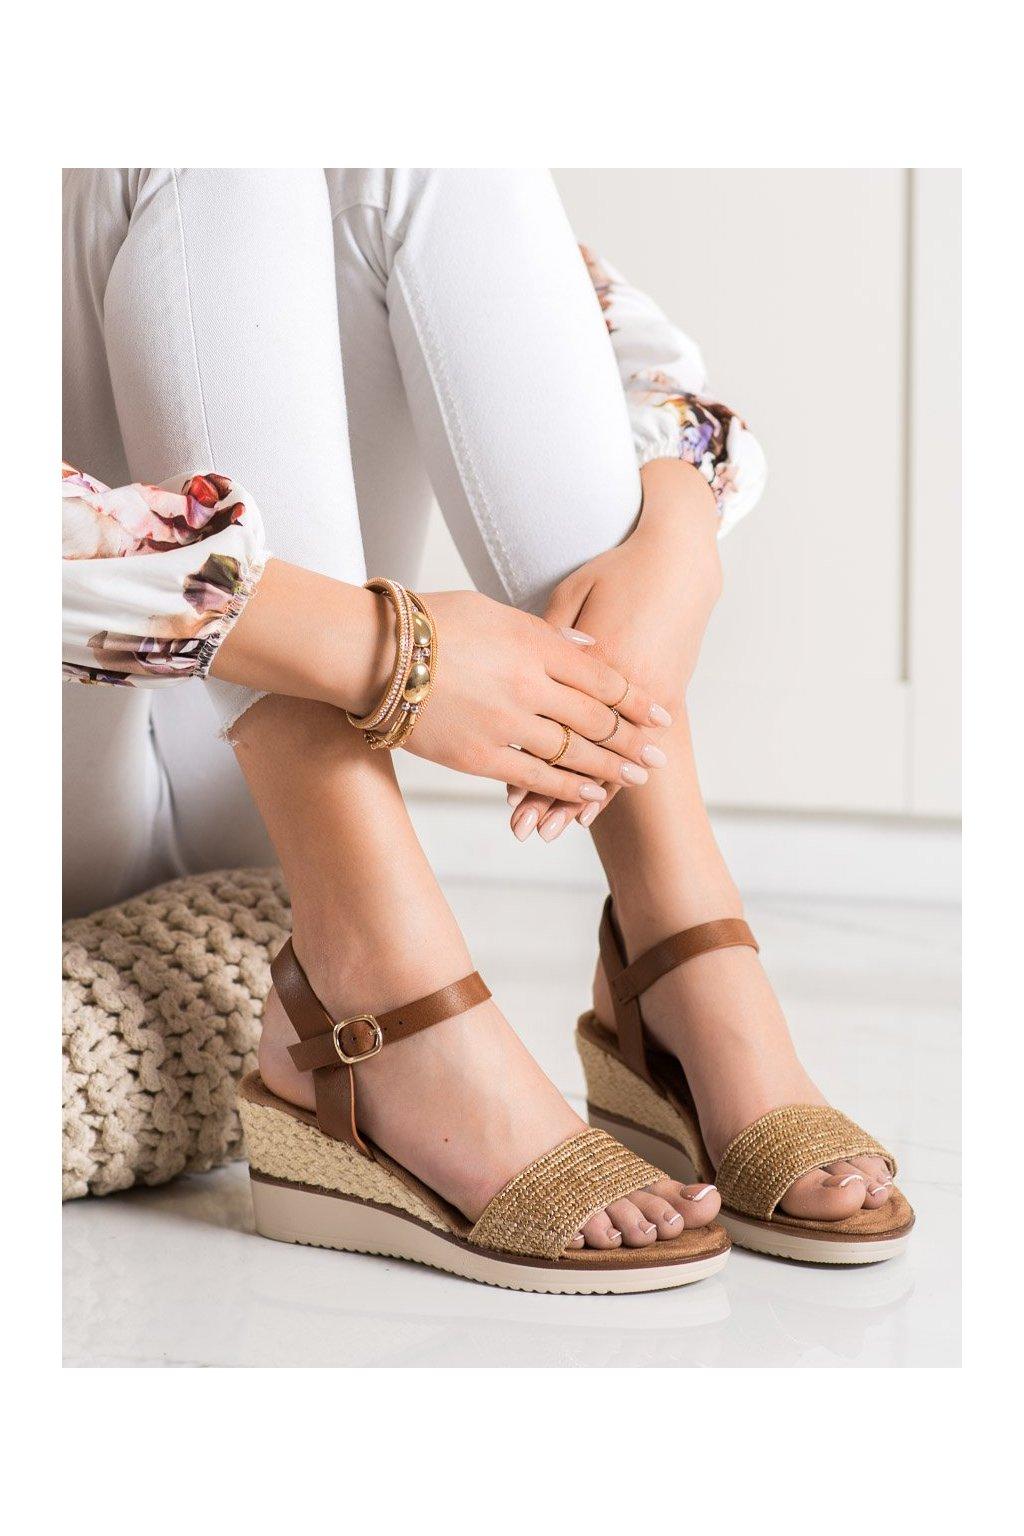 Hnedé sandále na platforme Evento kod 21SD98-3590BE